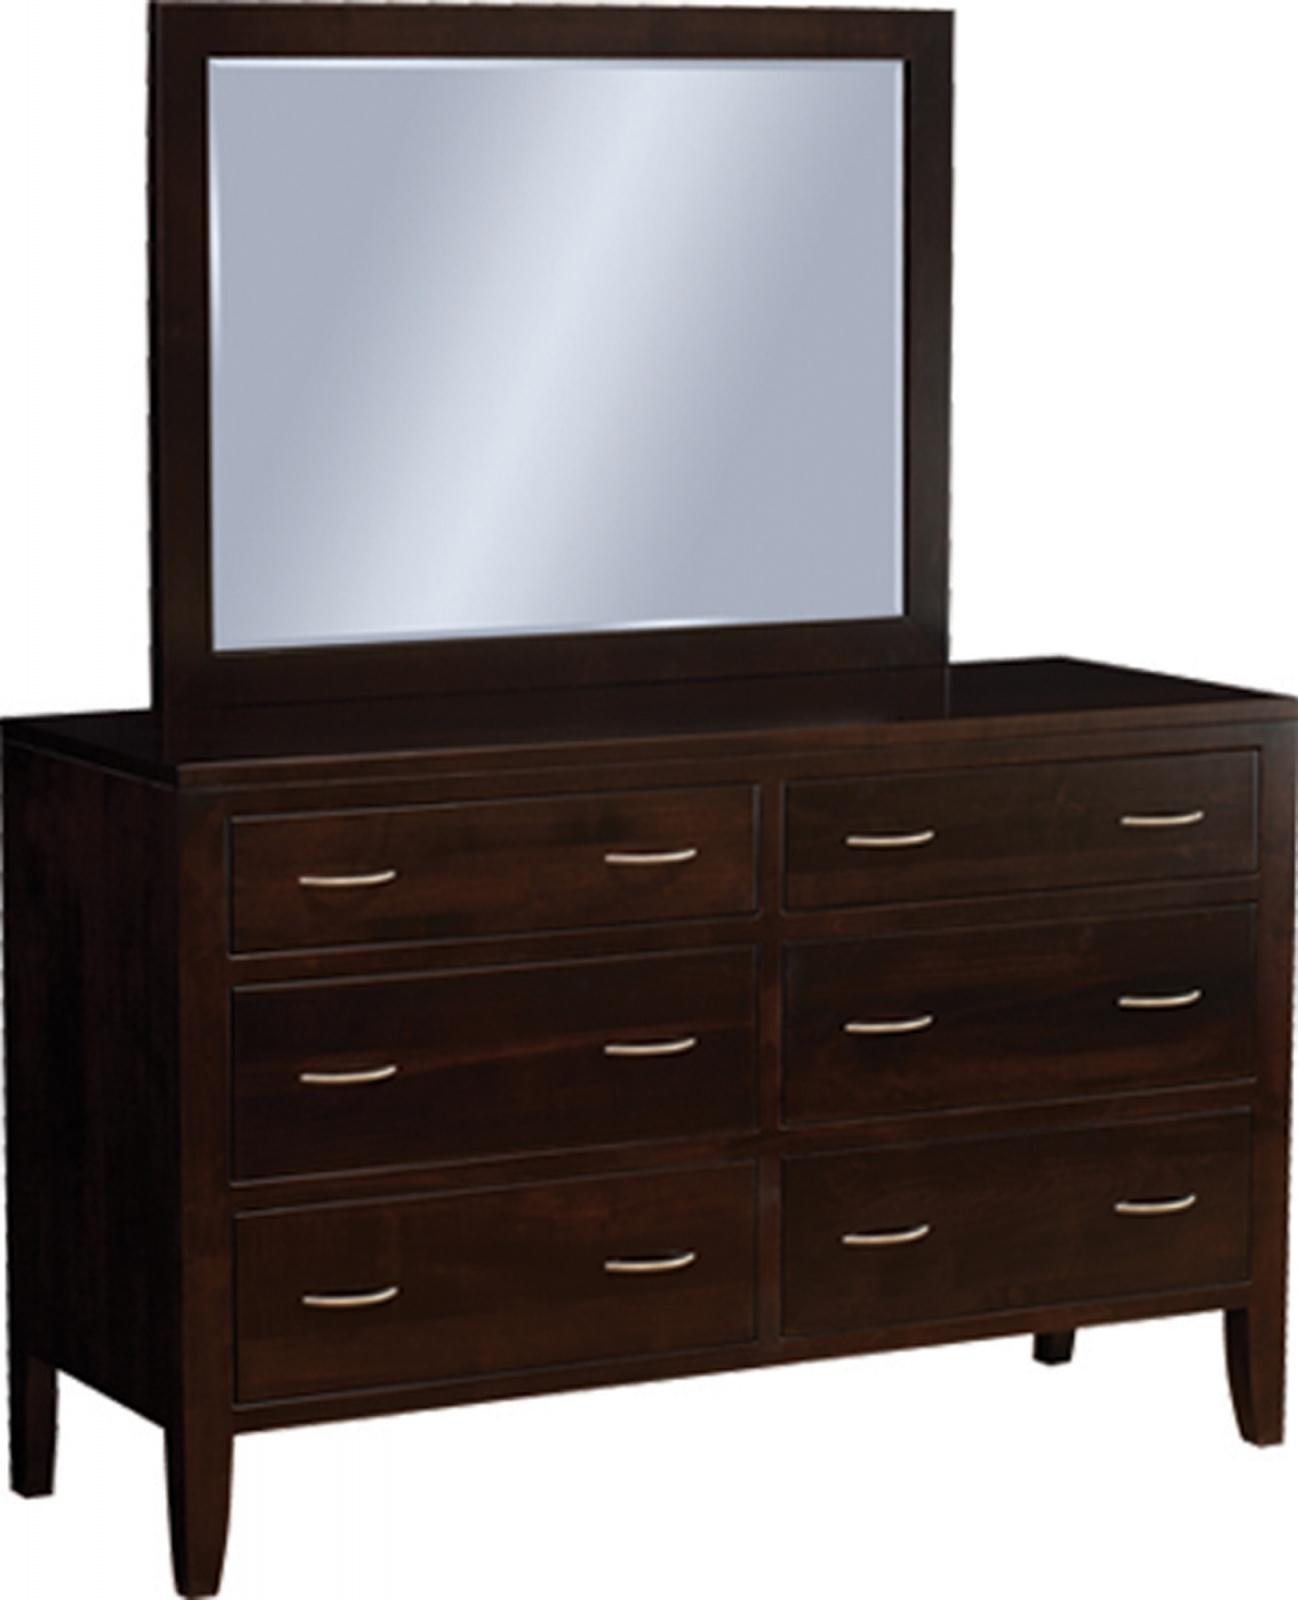 BR-1354 Double Dresser.jpg